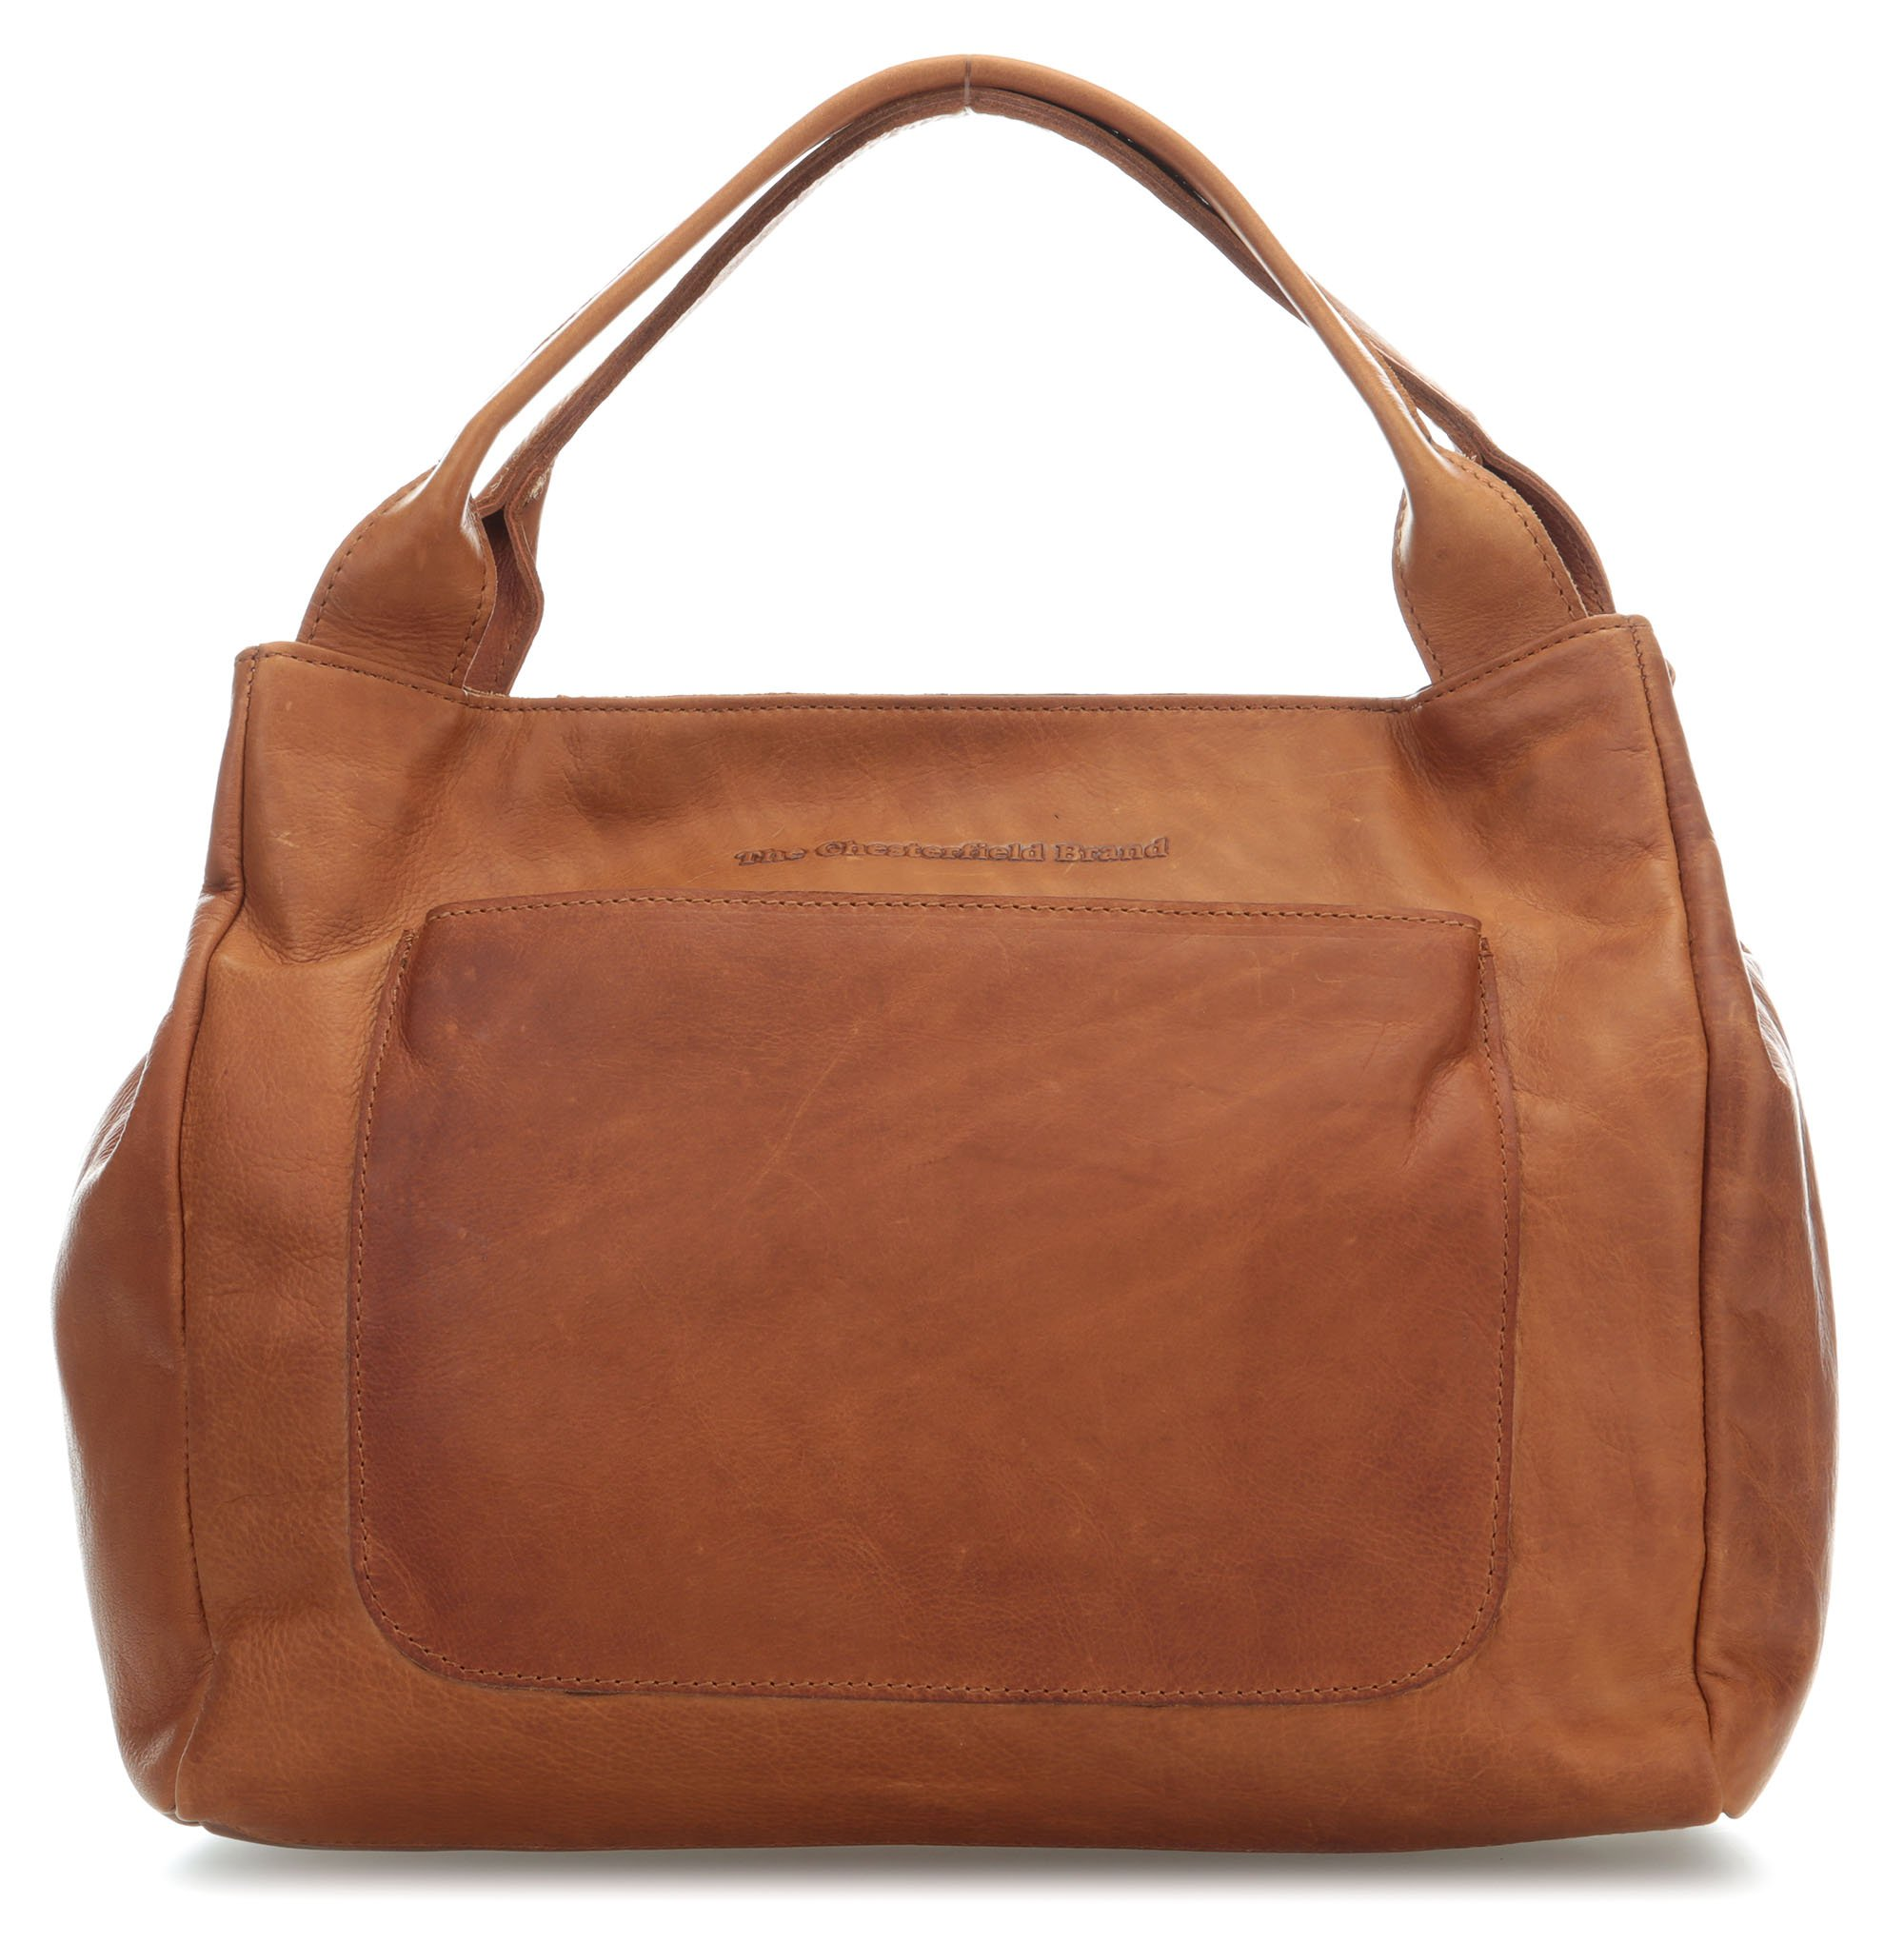 Cardiff Leder Handtasche in Cognac, TOP Qualität